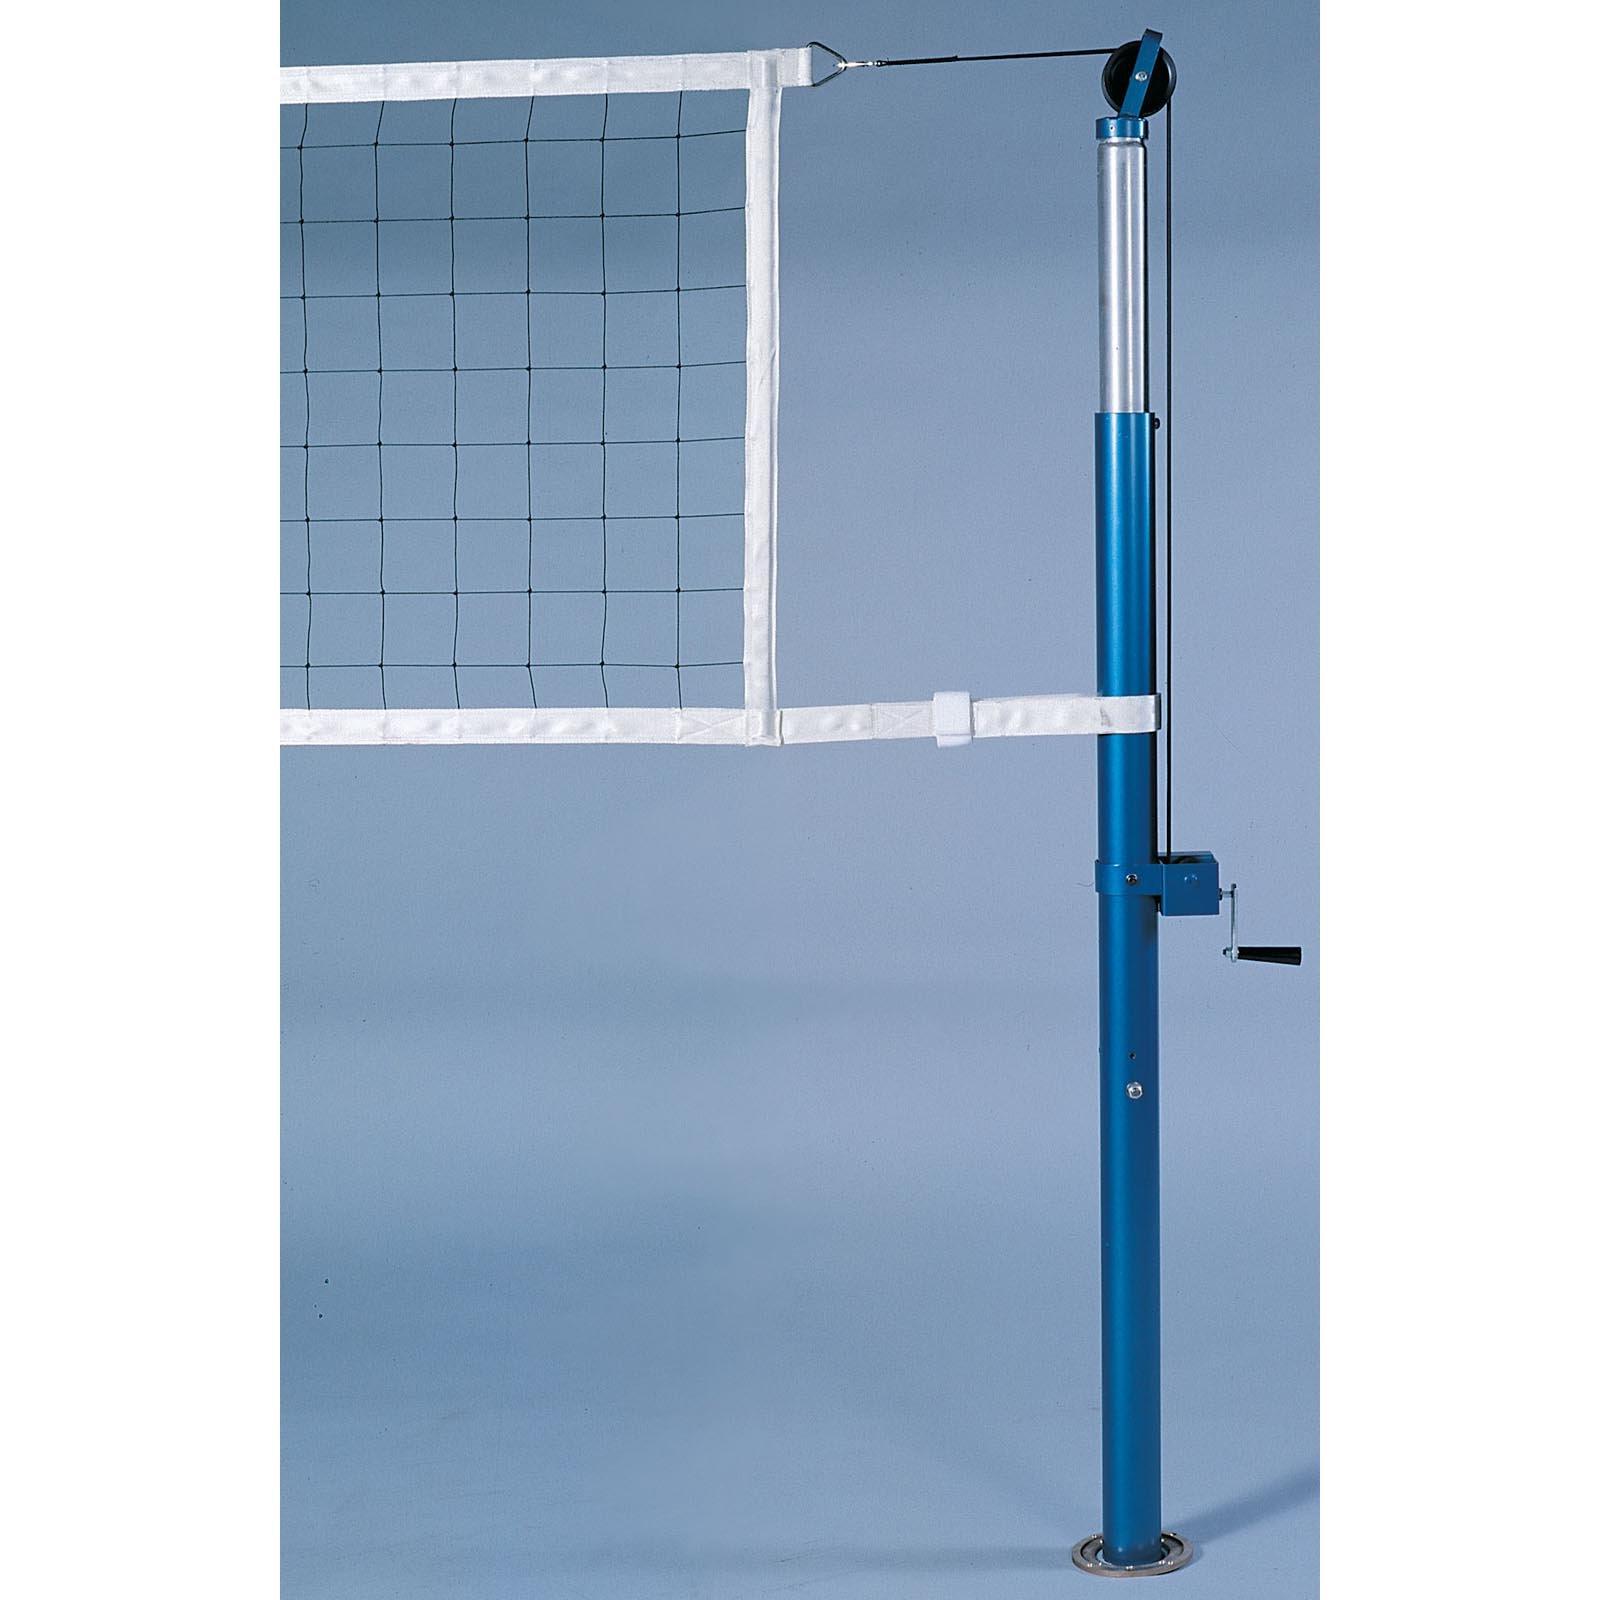 Jaypro 3.5 Inch Powerlite International Volleyball Net System